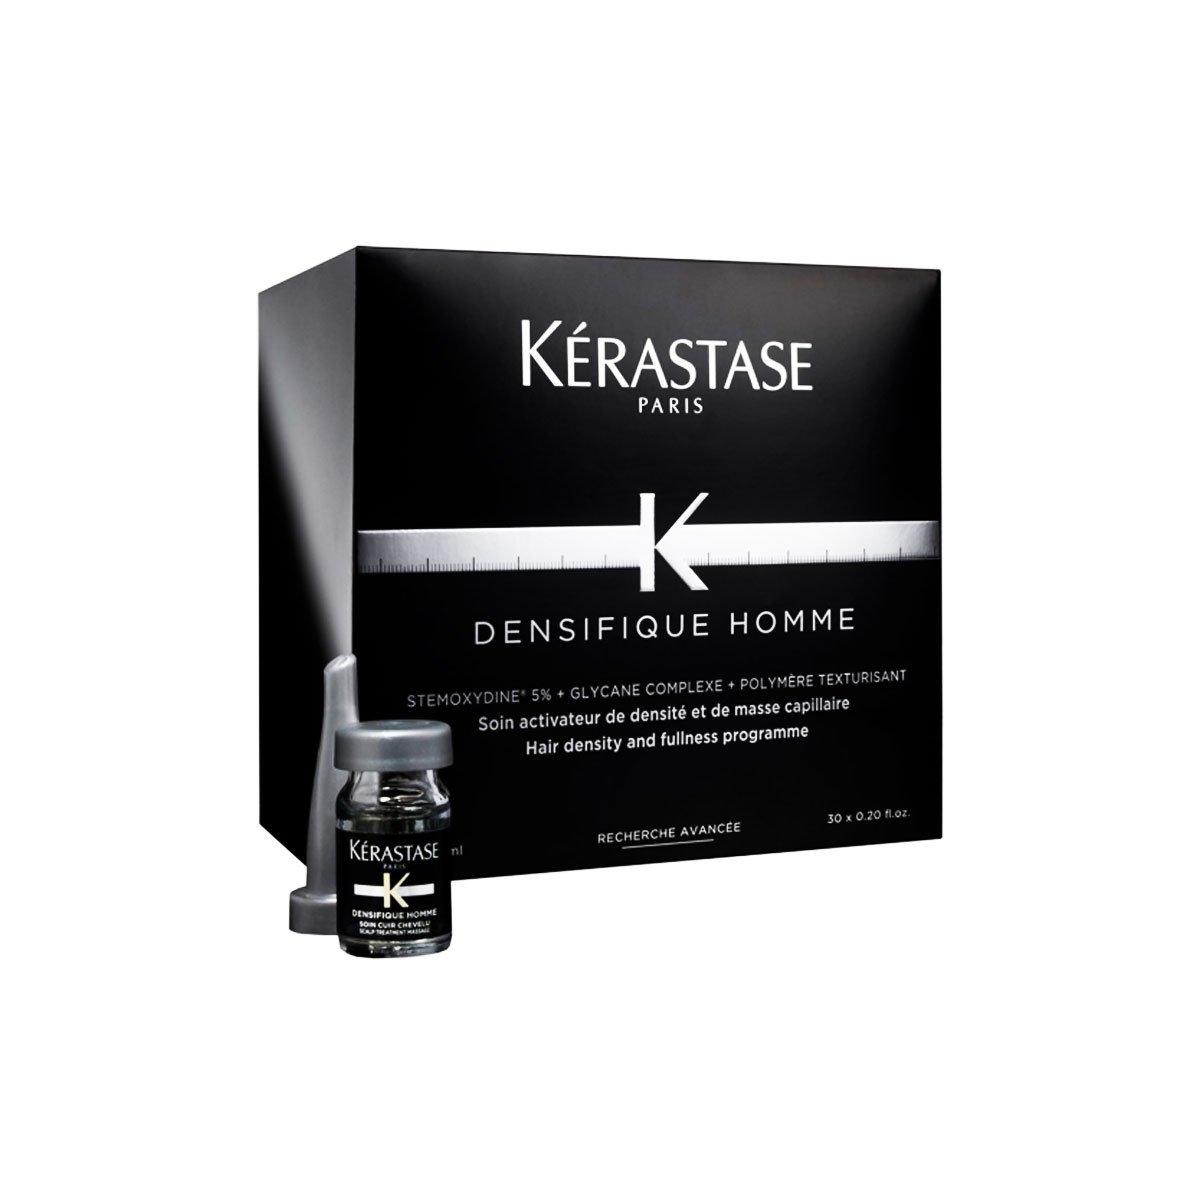 Kerastase Densify Homme Treatment 30x6ml [並行輸入品] B079Q5JWL1